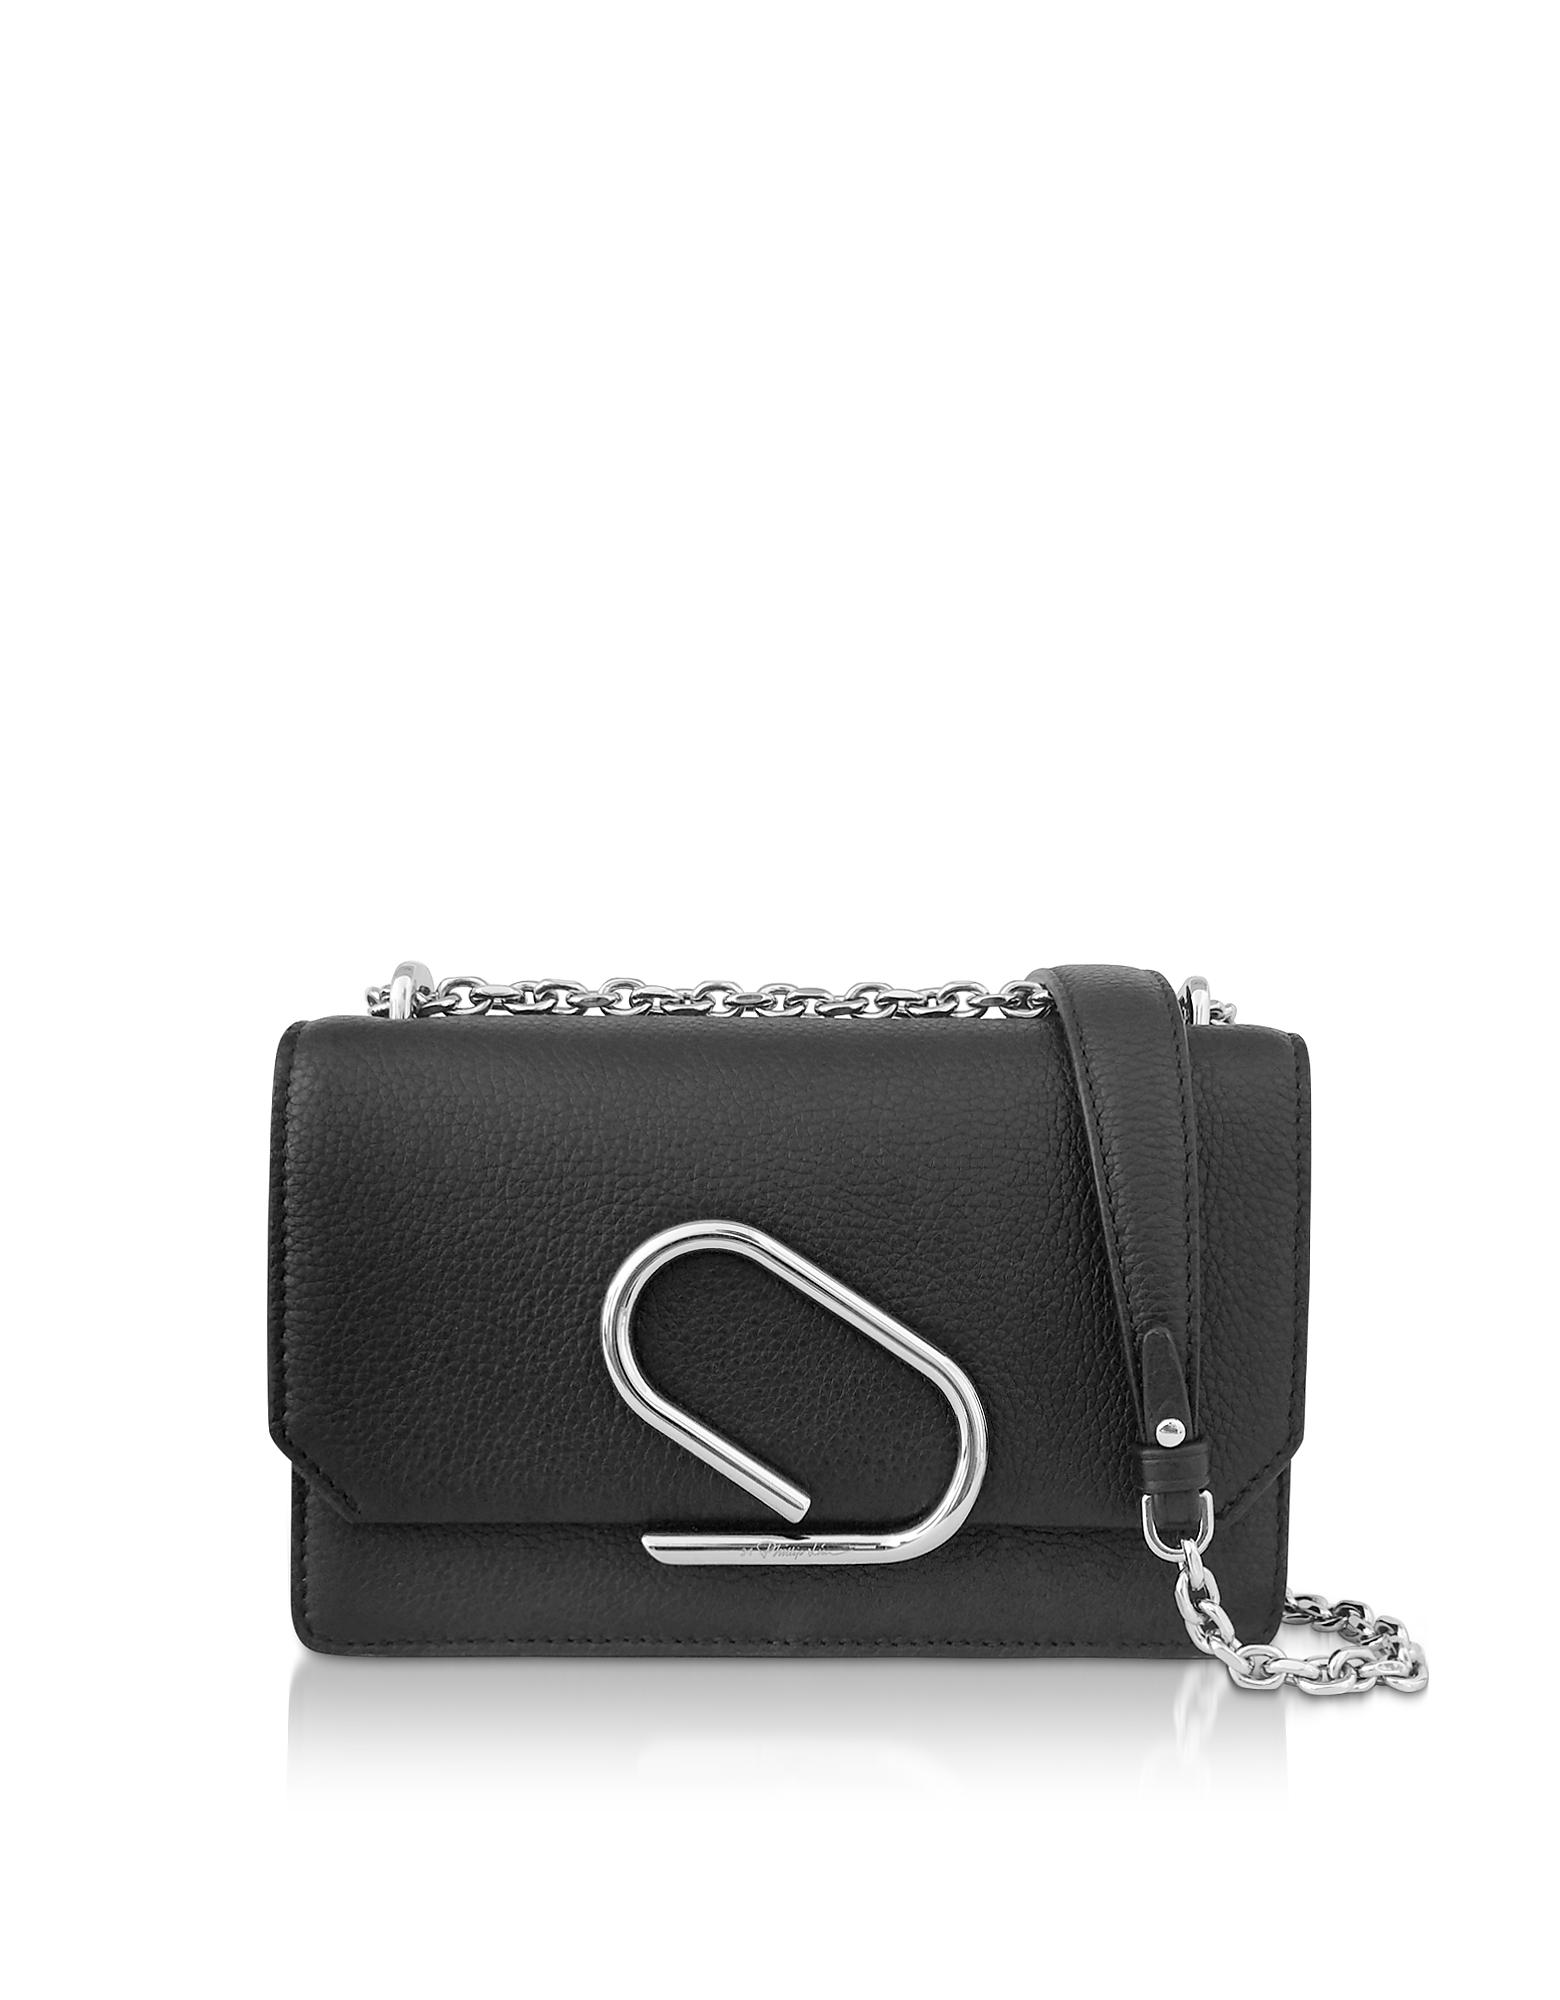 3.1 Phillip Lim  Handbags Black Alix Chain Clutch